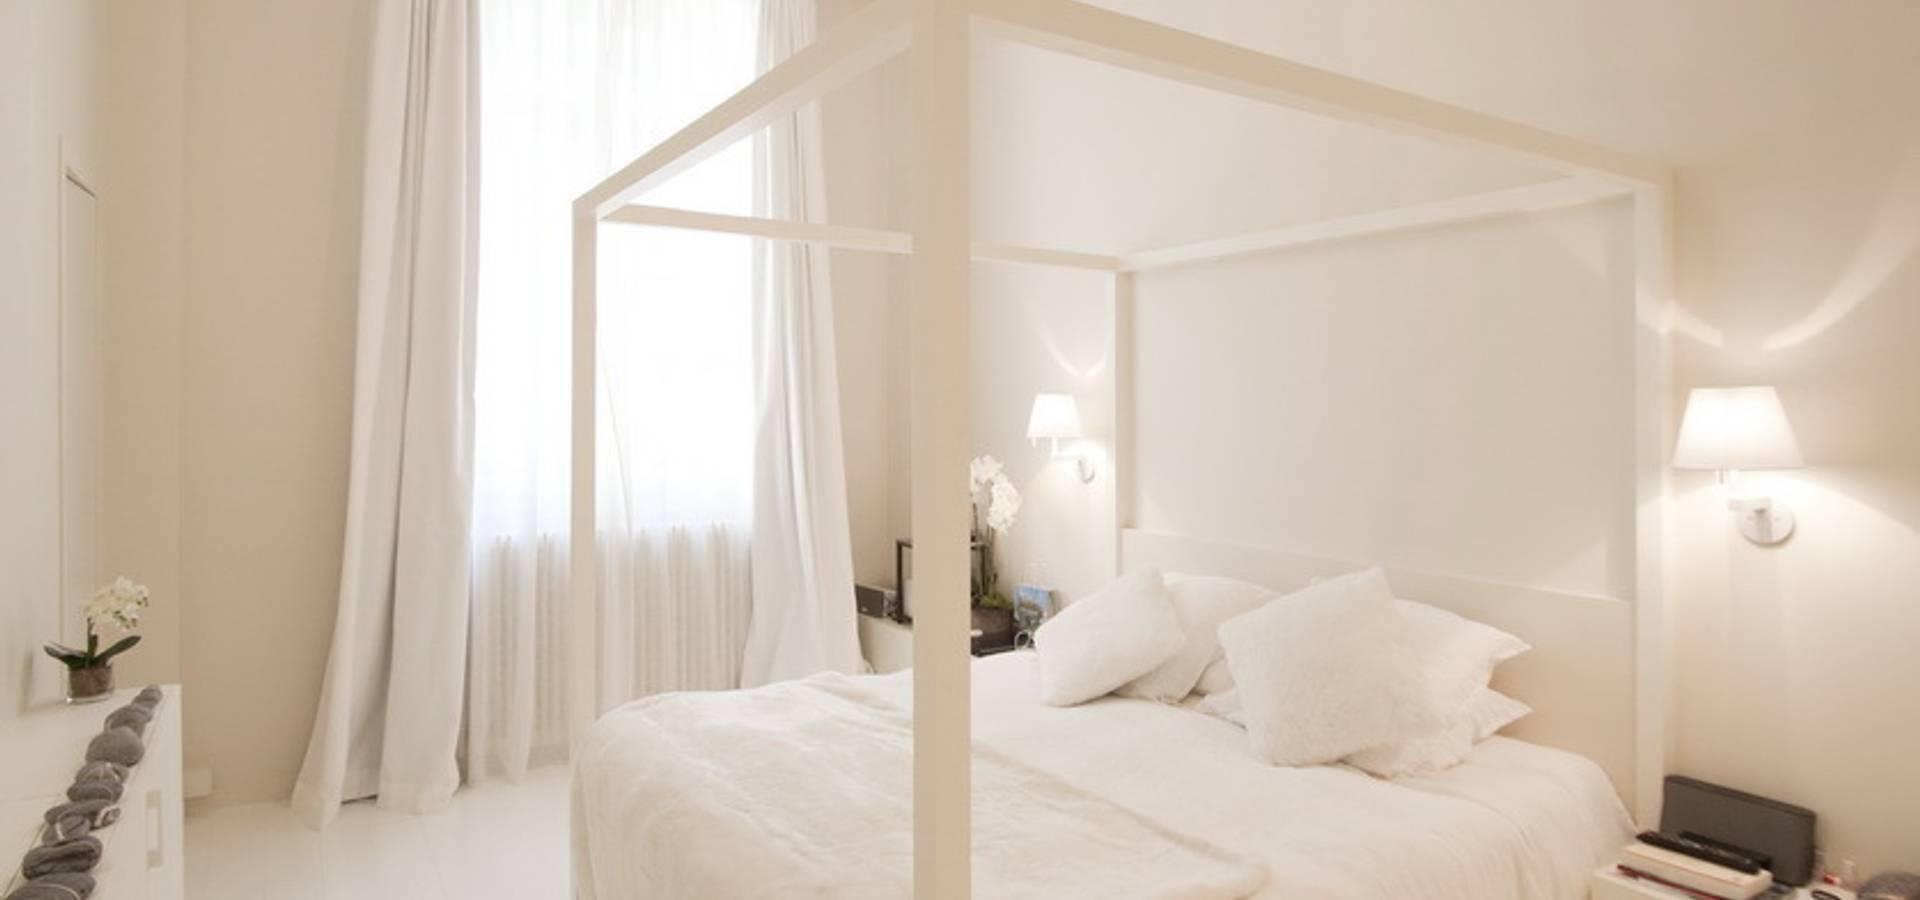 appartement luxembourg de feld architecture homify. Black Bedroom Furniture Sets. Home Design Ideas